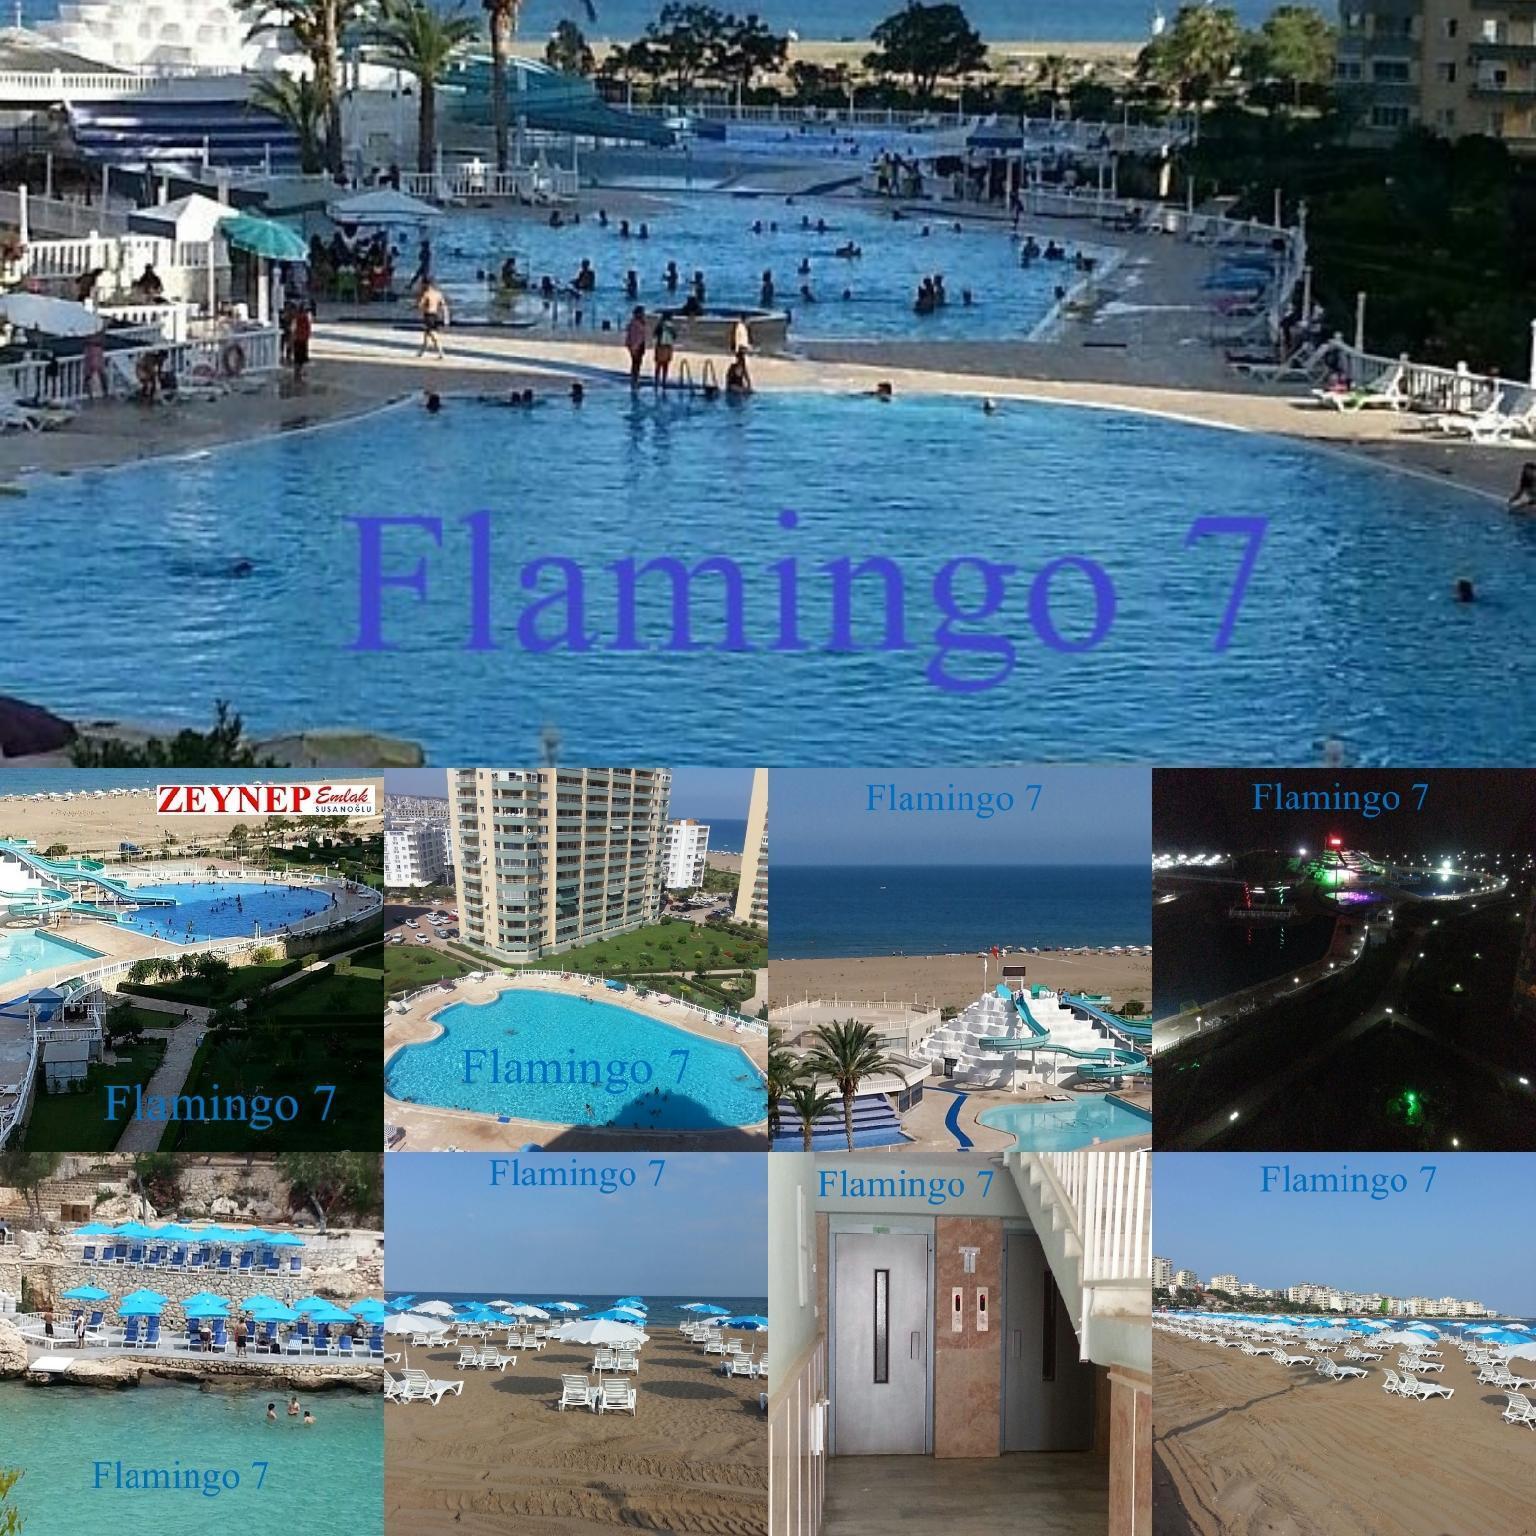 Denize Sifir Super Luks Tatil Sitesi Flamingo 7